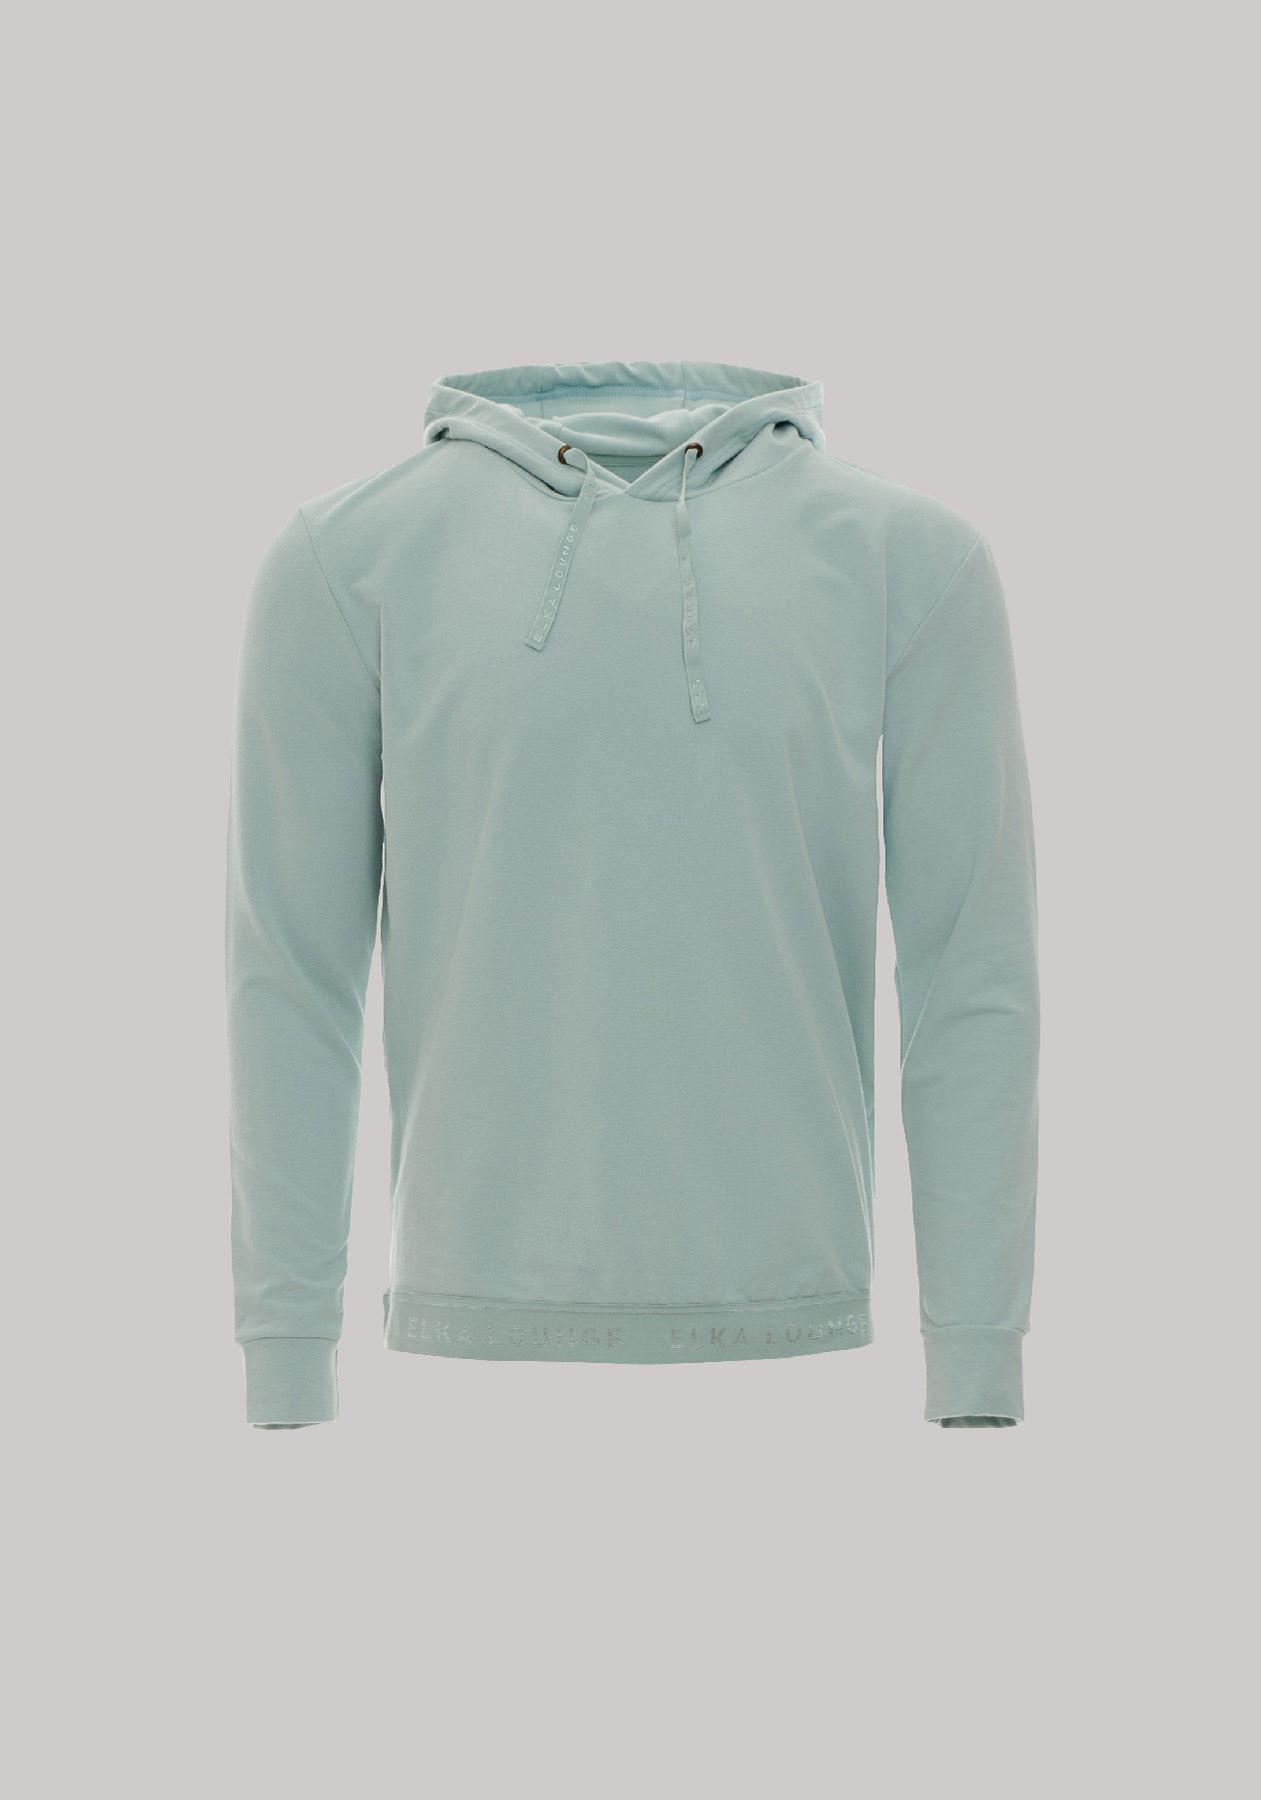 Men-Sweatshirt-ELKA-Lounge-M00572-02